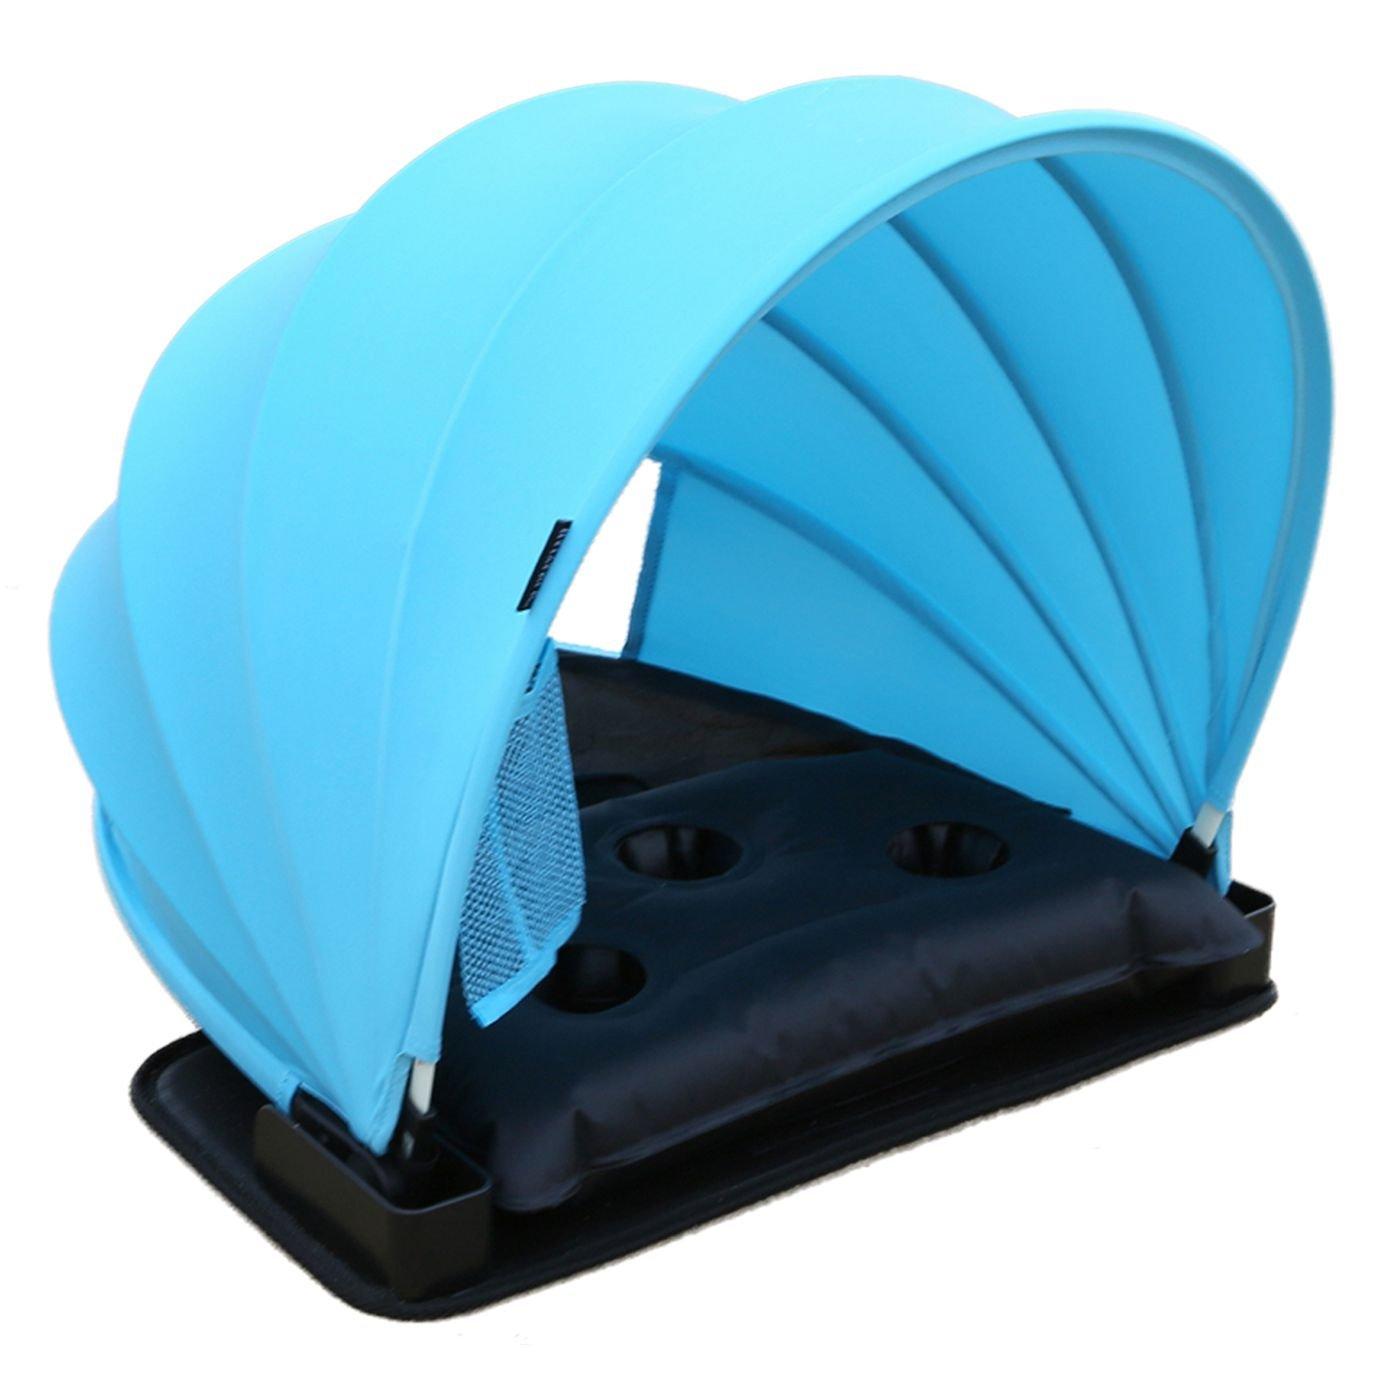 Shelter with Carry Case Shelter with Carry Case Blue Mat AirGoods HAIYANLE Pop Up Portable Adjustable Beach Sun Shade Canopy Instant Outdoors Beach Tent